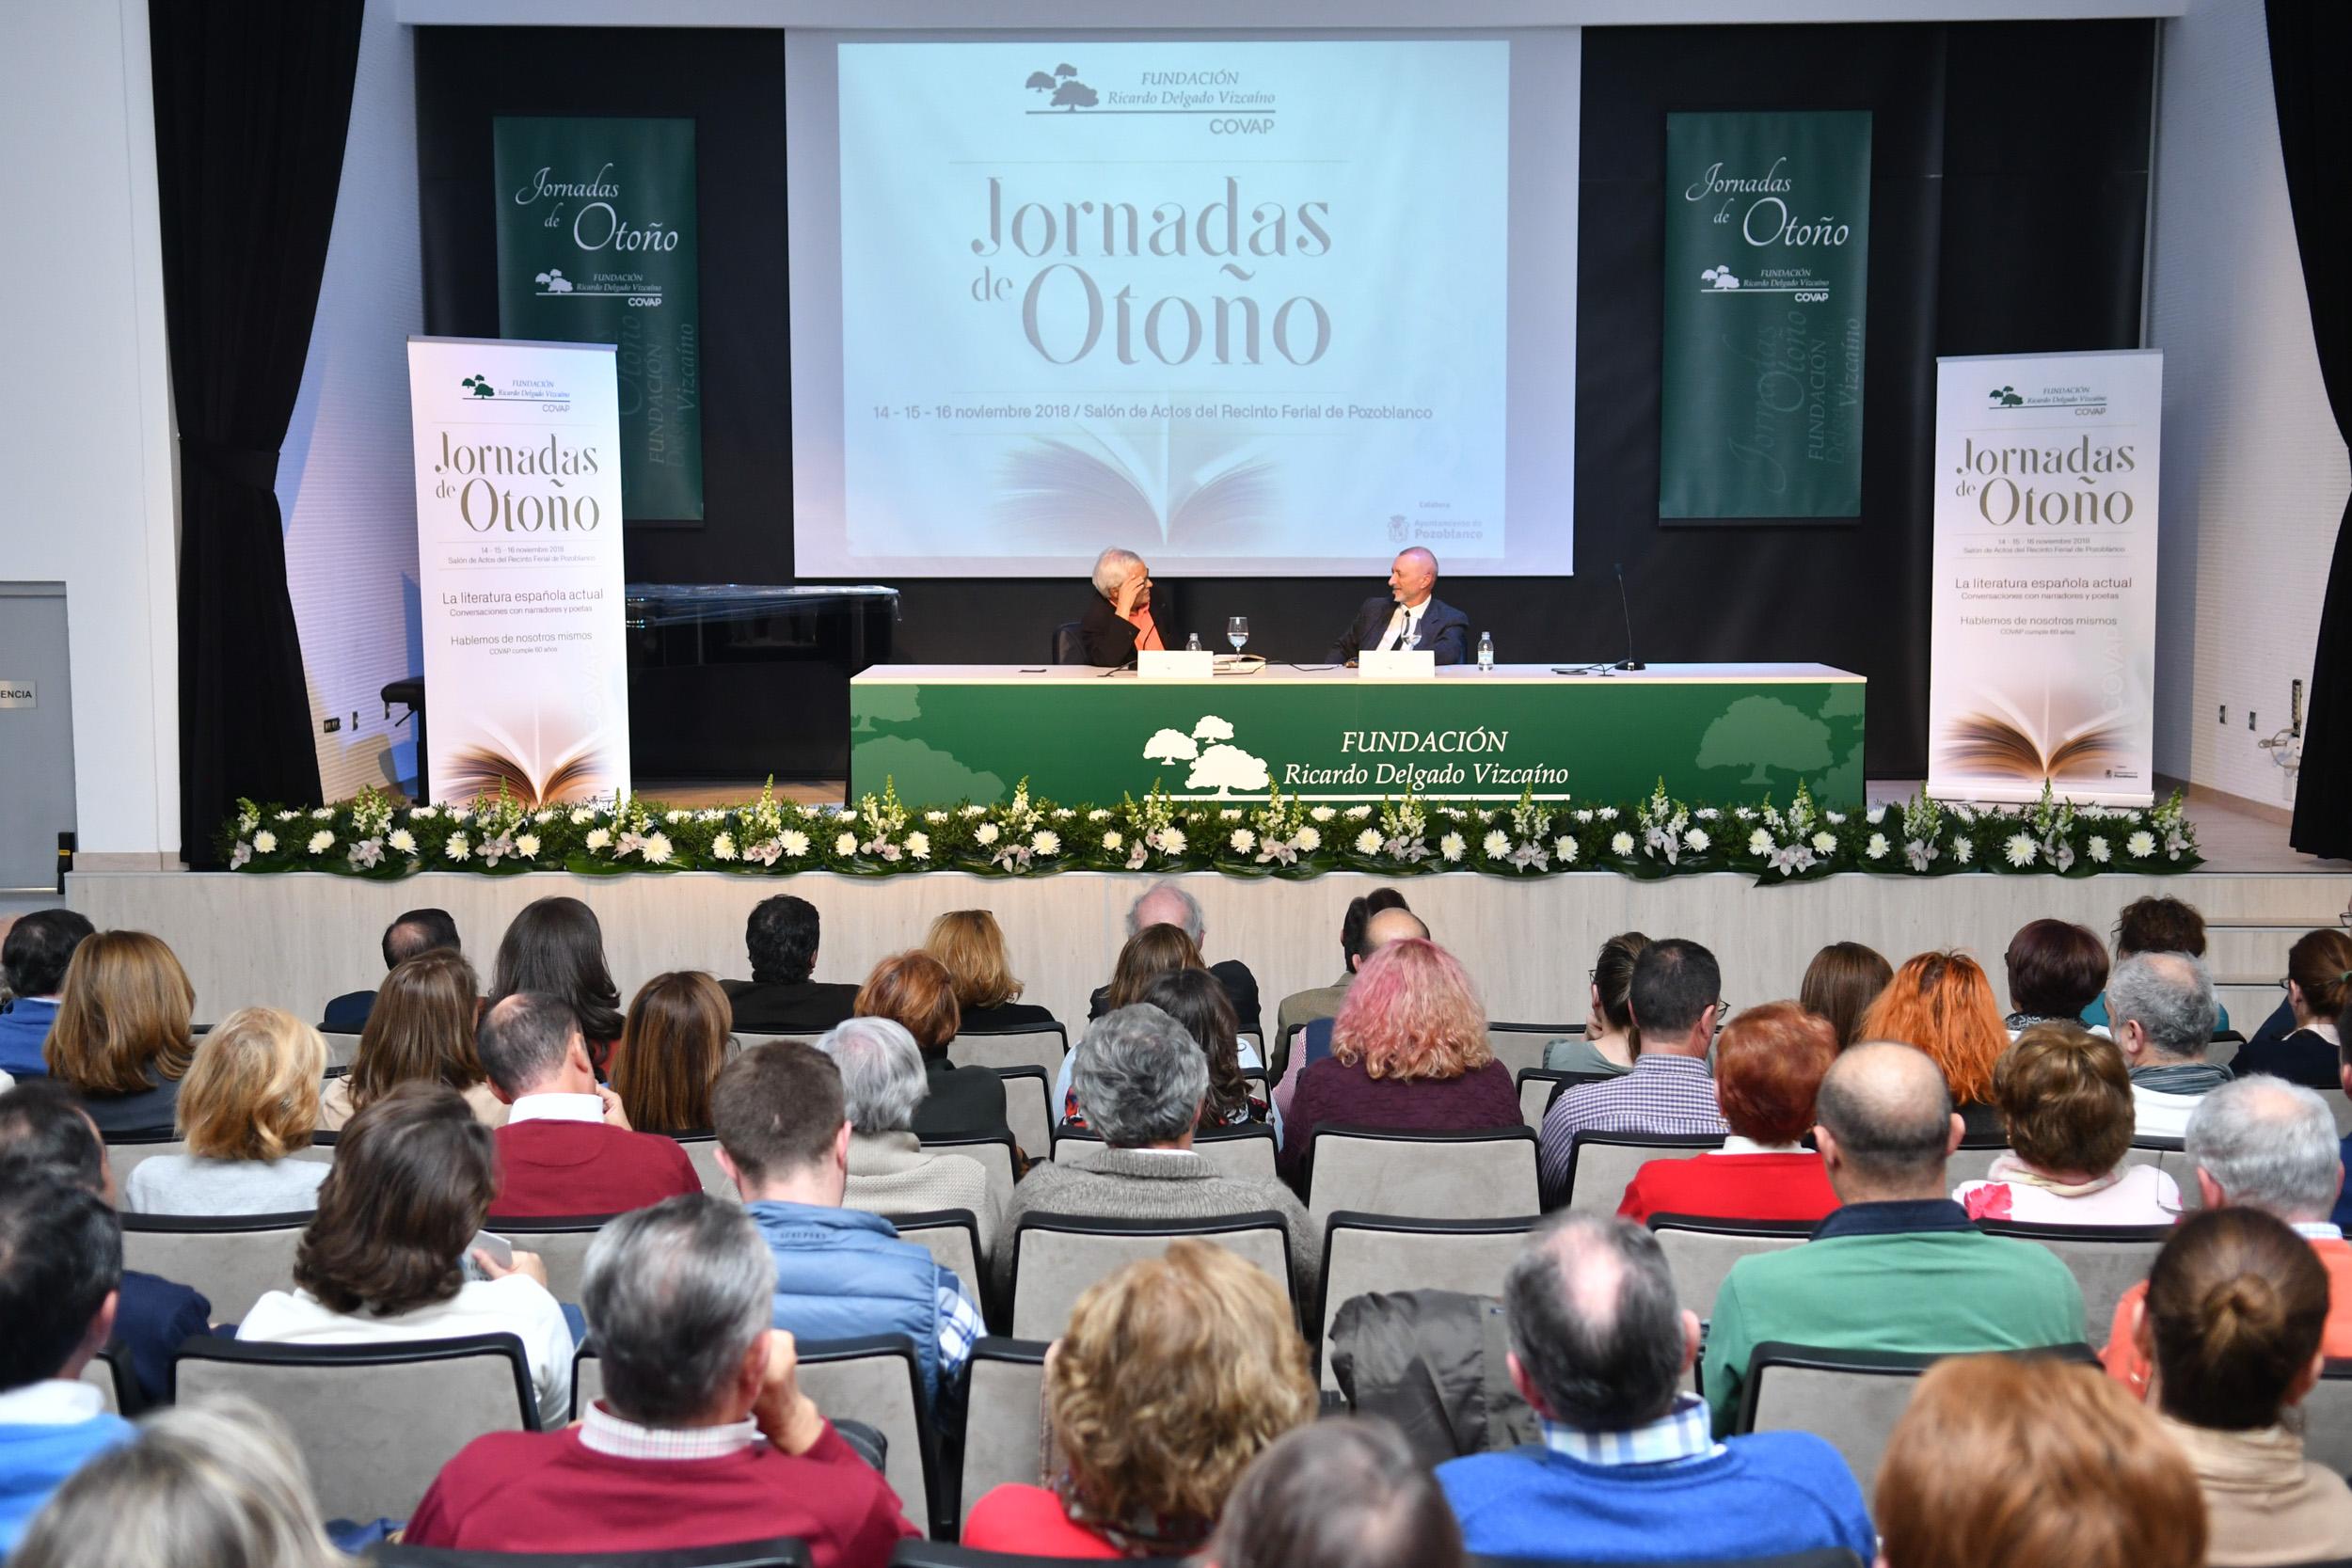 Jornadas de Otoño | COVAP